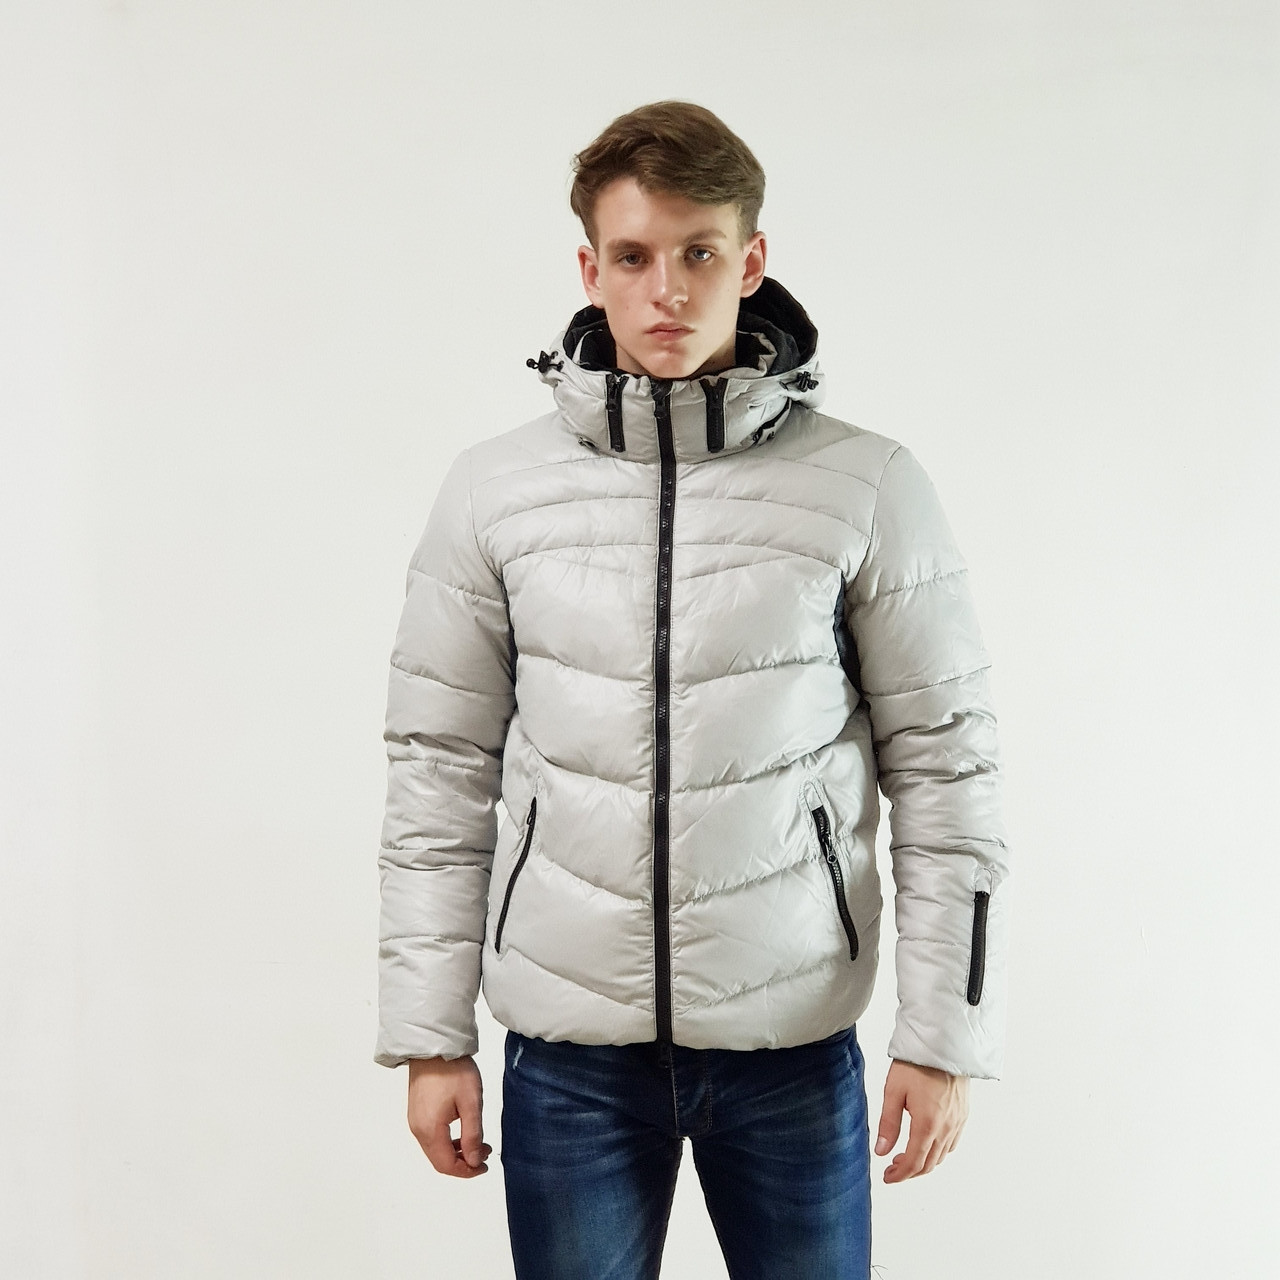 Куртка мужская зимняя Snowimage с капюшоном 46 светло-серый 130-9299